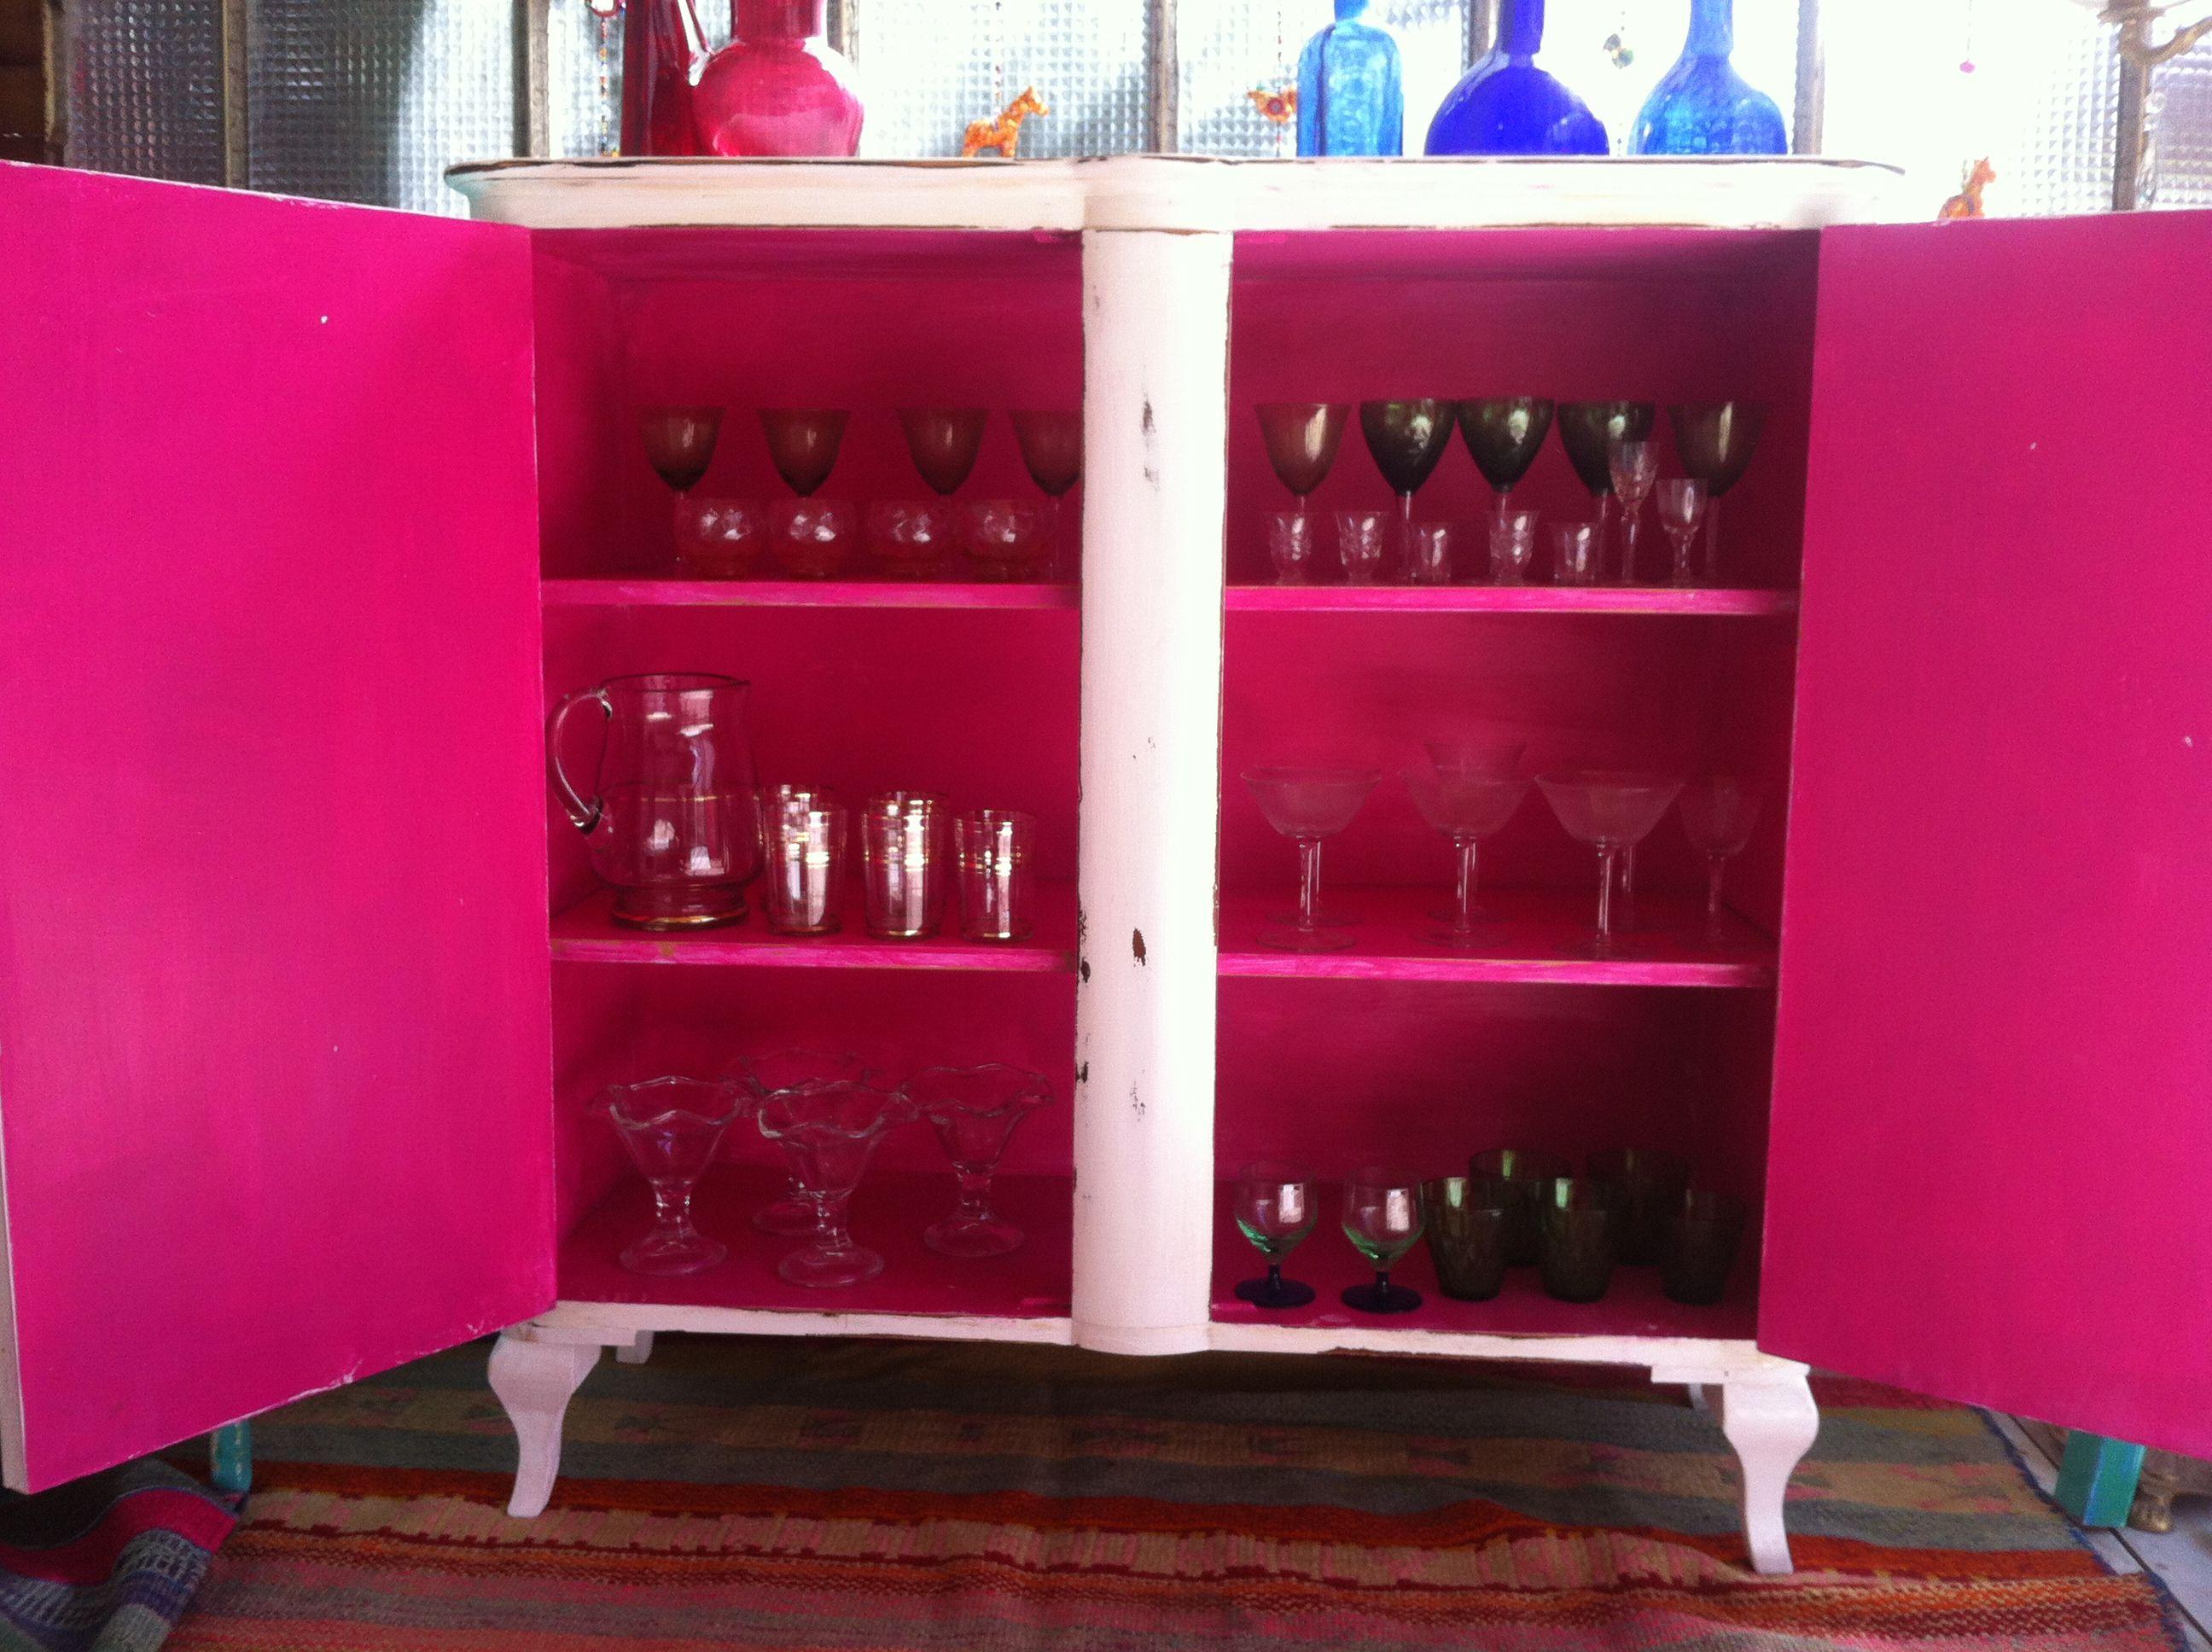 Vajillero Frances Blanco Interior Fucsia Muebles Vintouch De  # Muebles Color Fucsia